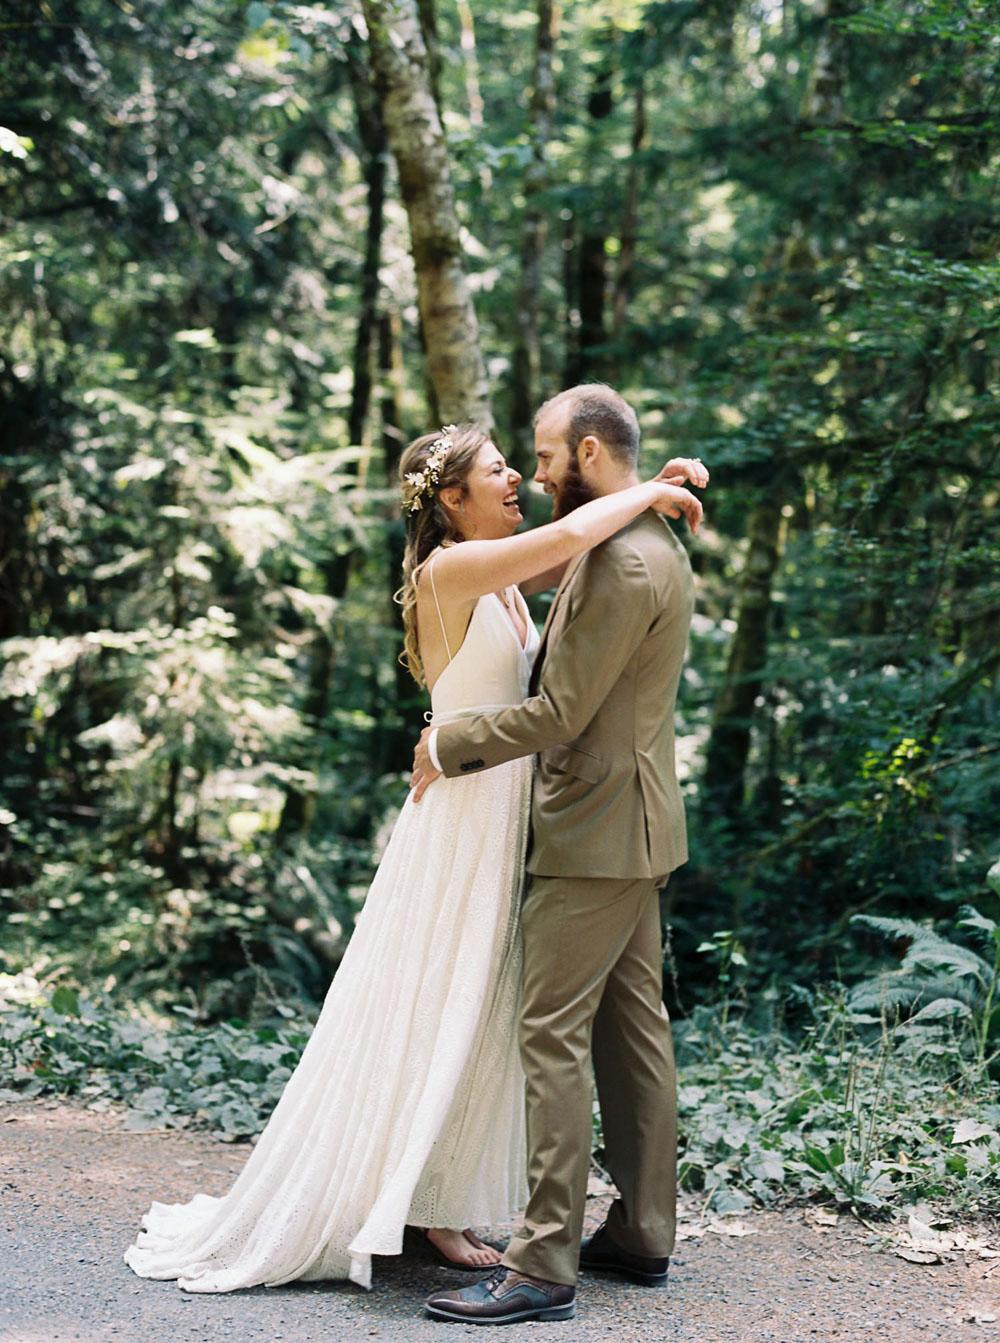 Seattle Wedding Photographer Anna Peters captures bride and groom atWellspring Spa Wedding at Mt. Rainier